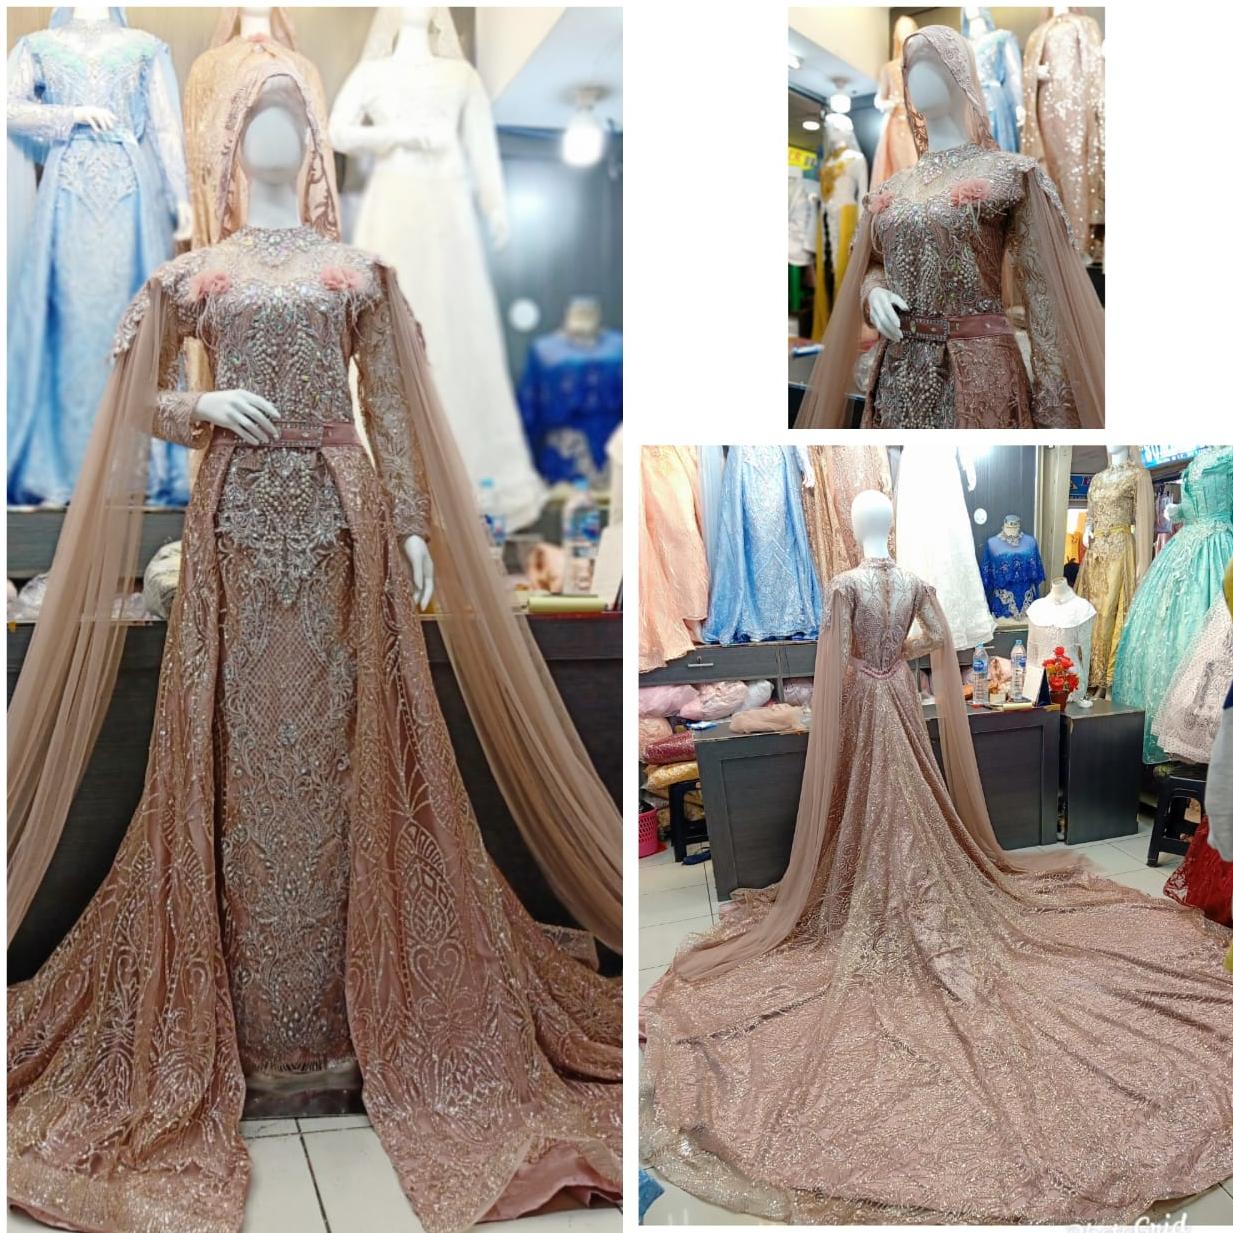 TERMURAH !! gaun pengantin modern / gaun akad modern ORIGINAL / KEBAYA  pengantin terbaru 10